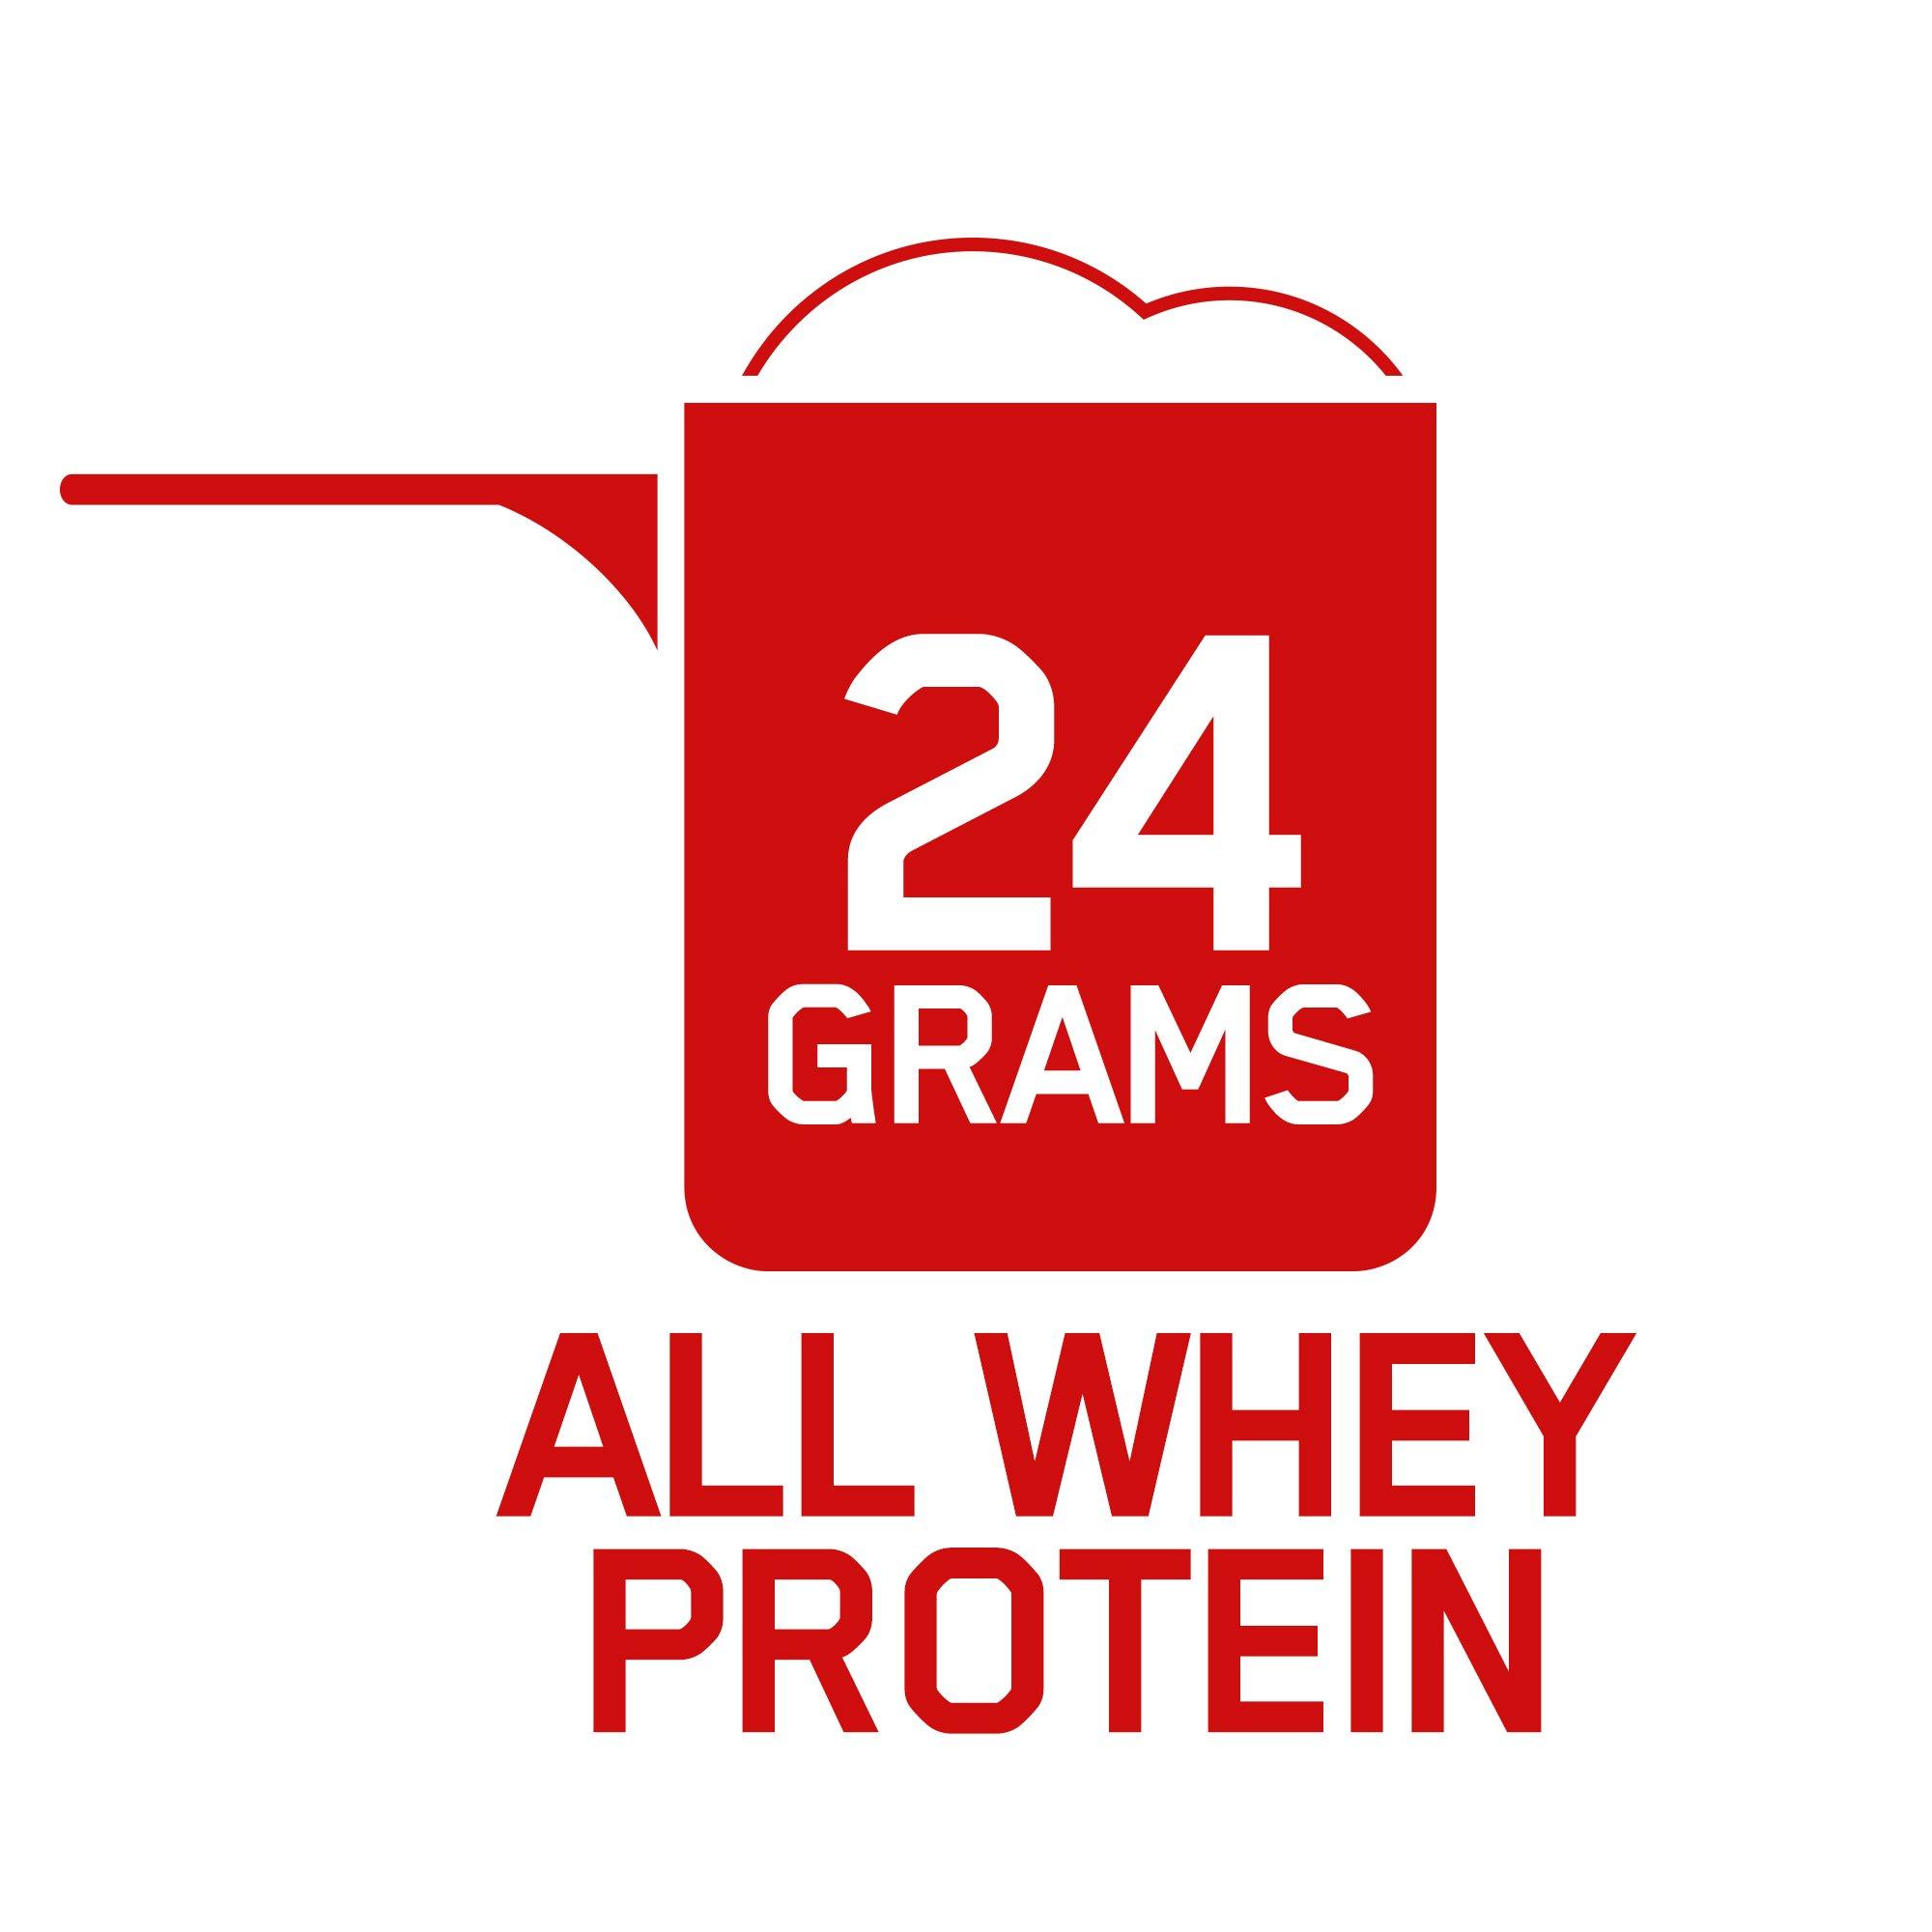 OPTIMUM NUTRITION GOLD STANDARD 100% Whey Protein Powder, Extreme Milk Chocolate, 10 Pound by Optimum Nutrition (Image #8)